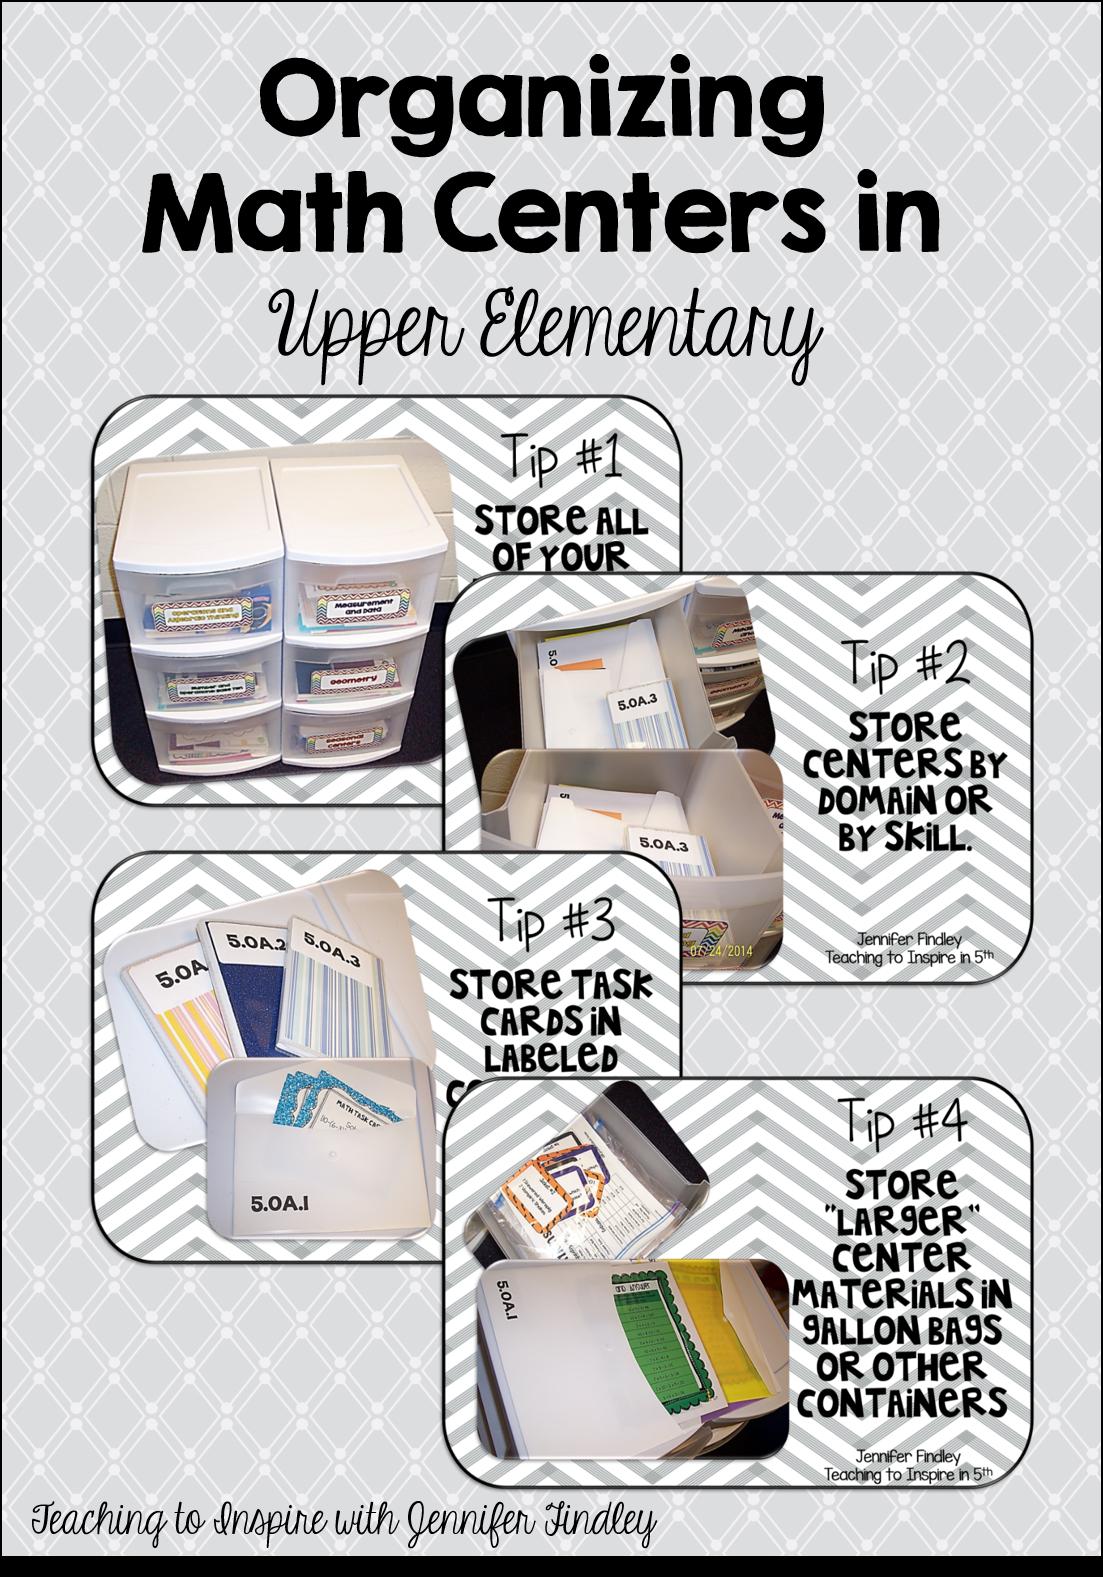 Organizing Math Centers